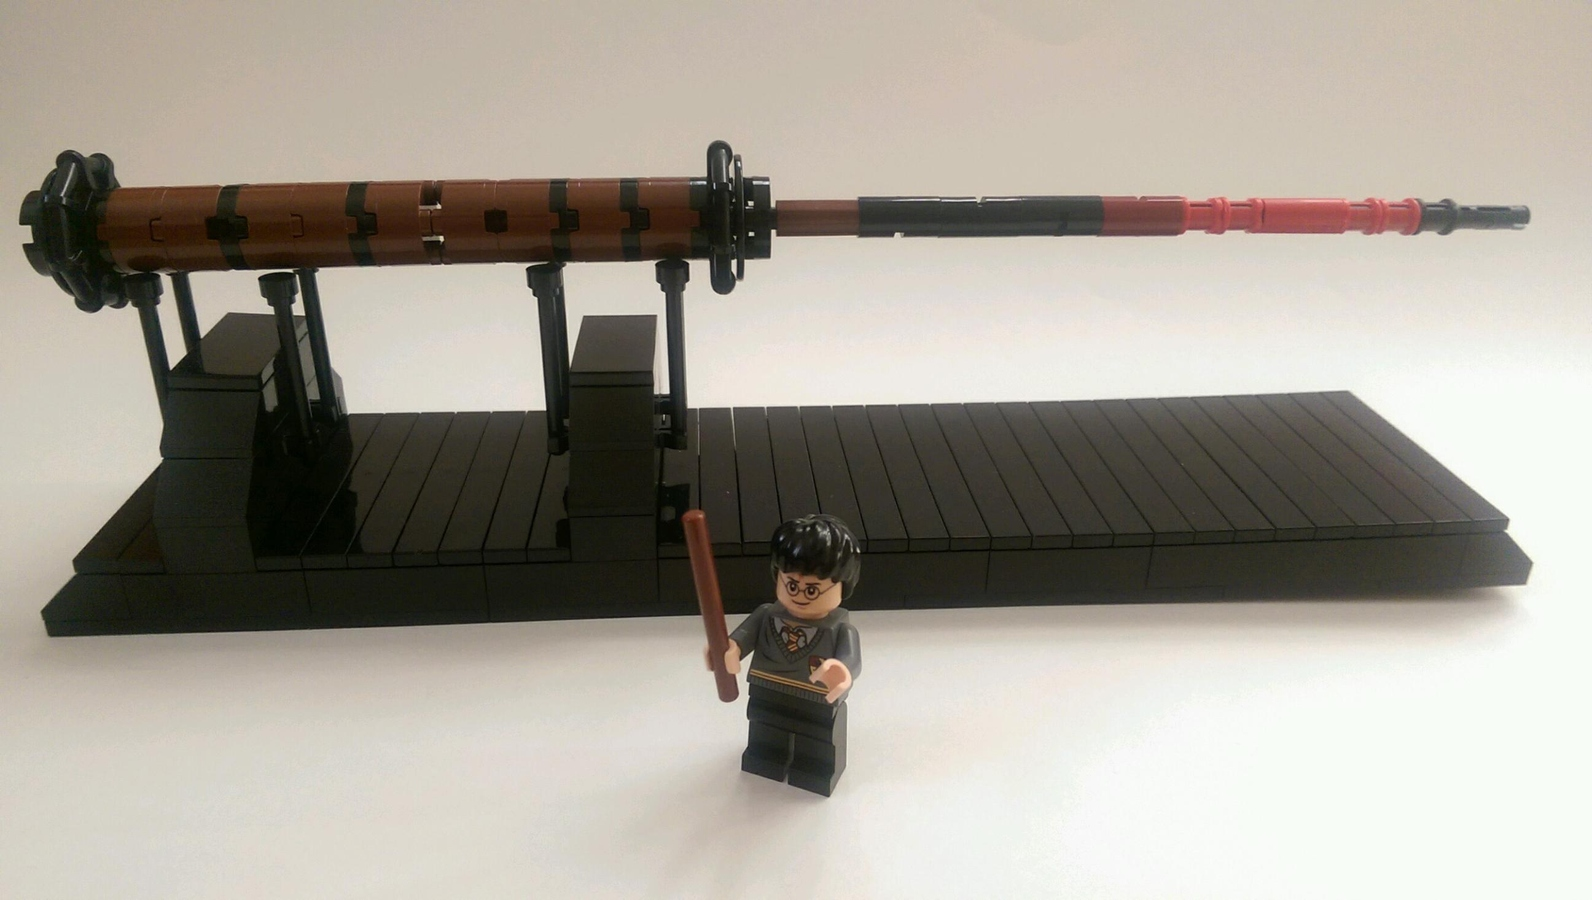 lego ideas - product ideas - harry potter's magic wand